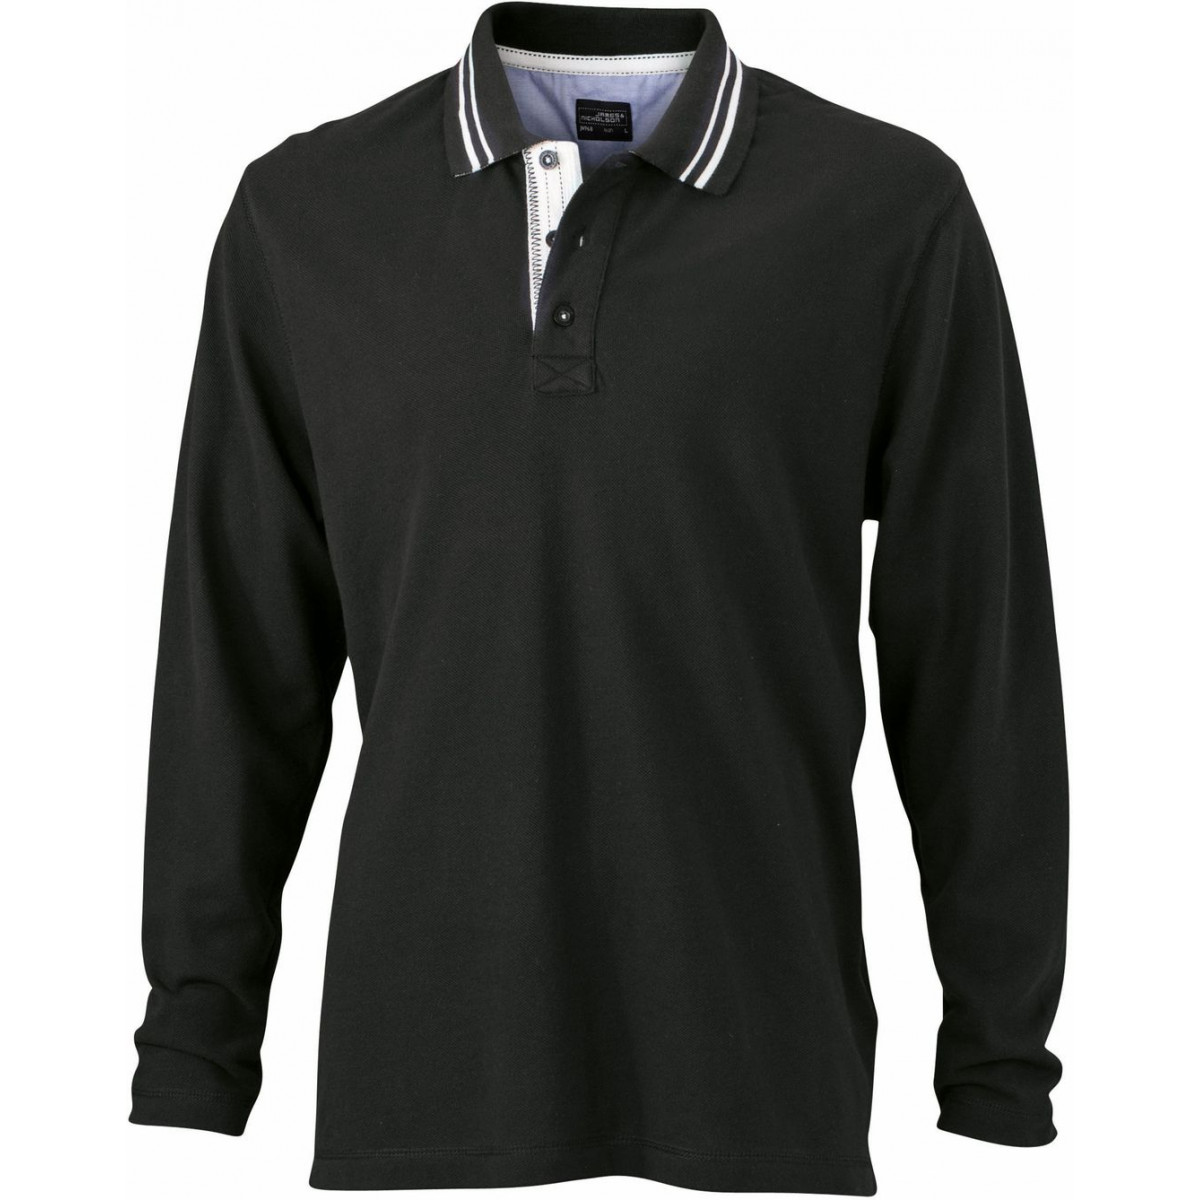 Рубашка поло мужская JN968 Mens Polo Long-Sleeved - Черный/Белый